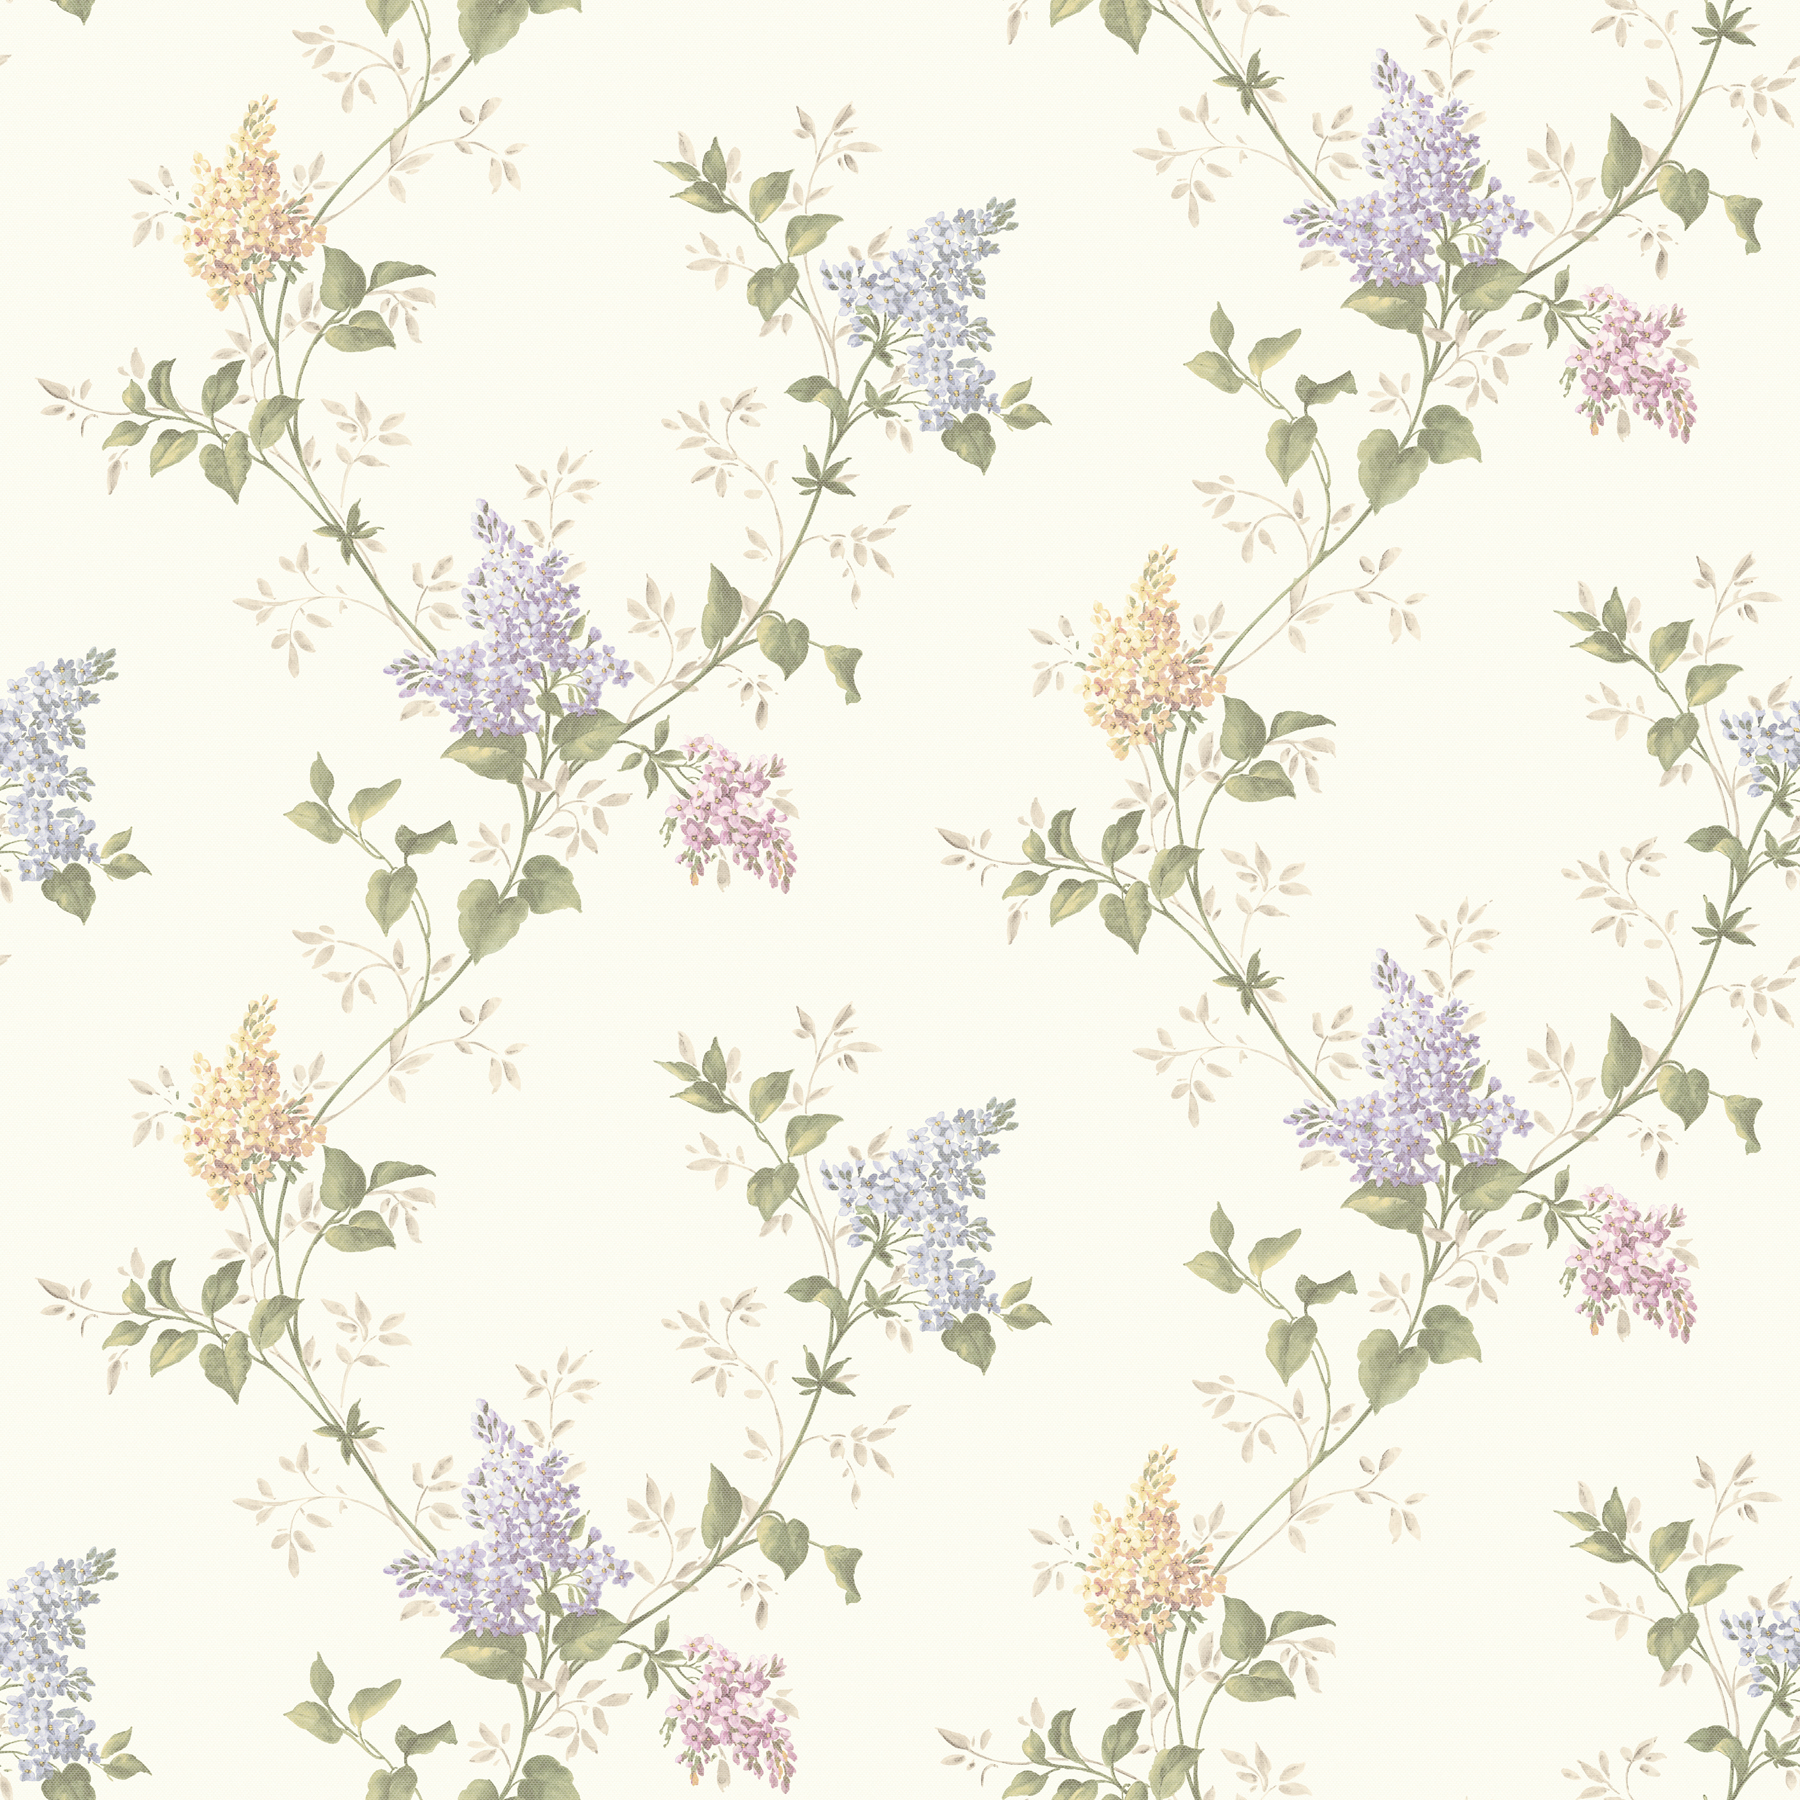 Picture of Ascott Purple Lilac Trail Wallpaper